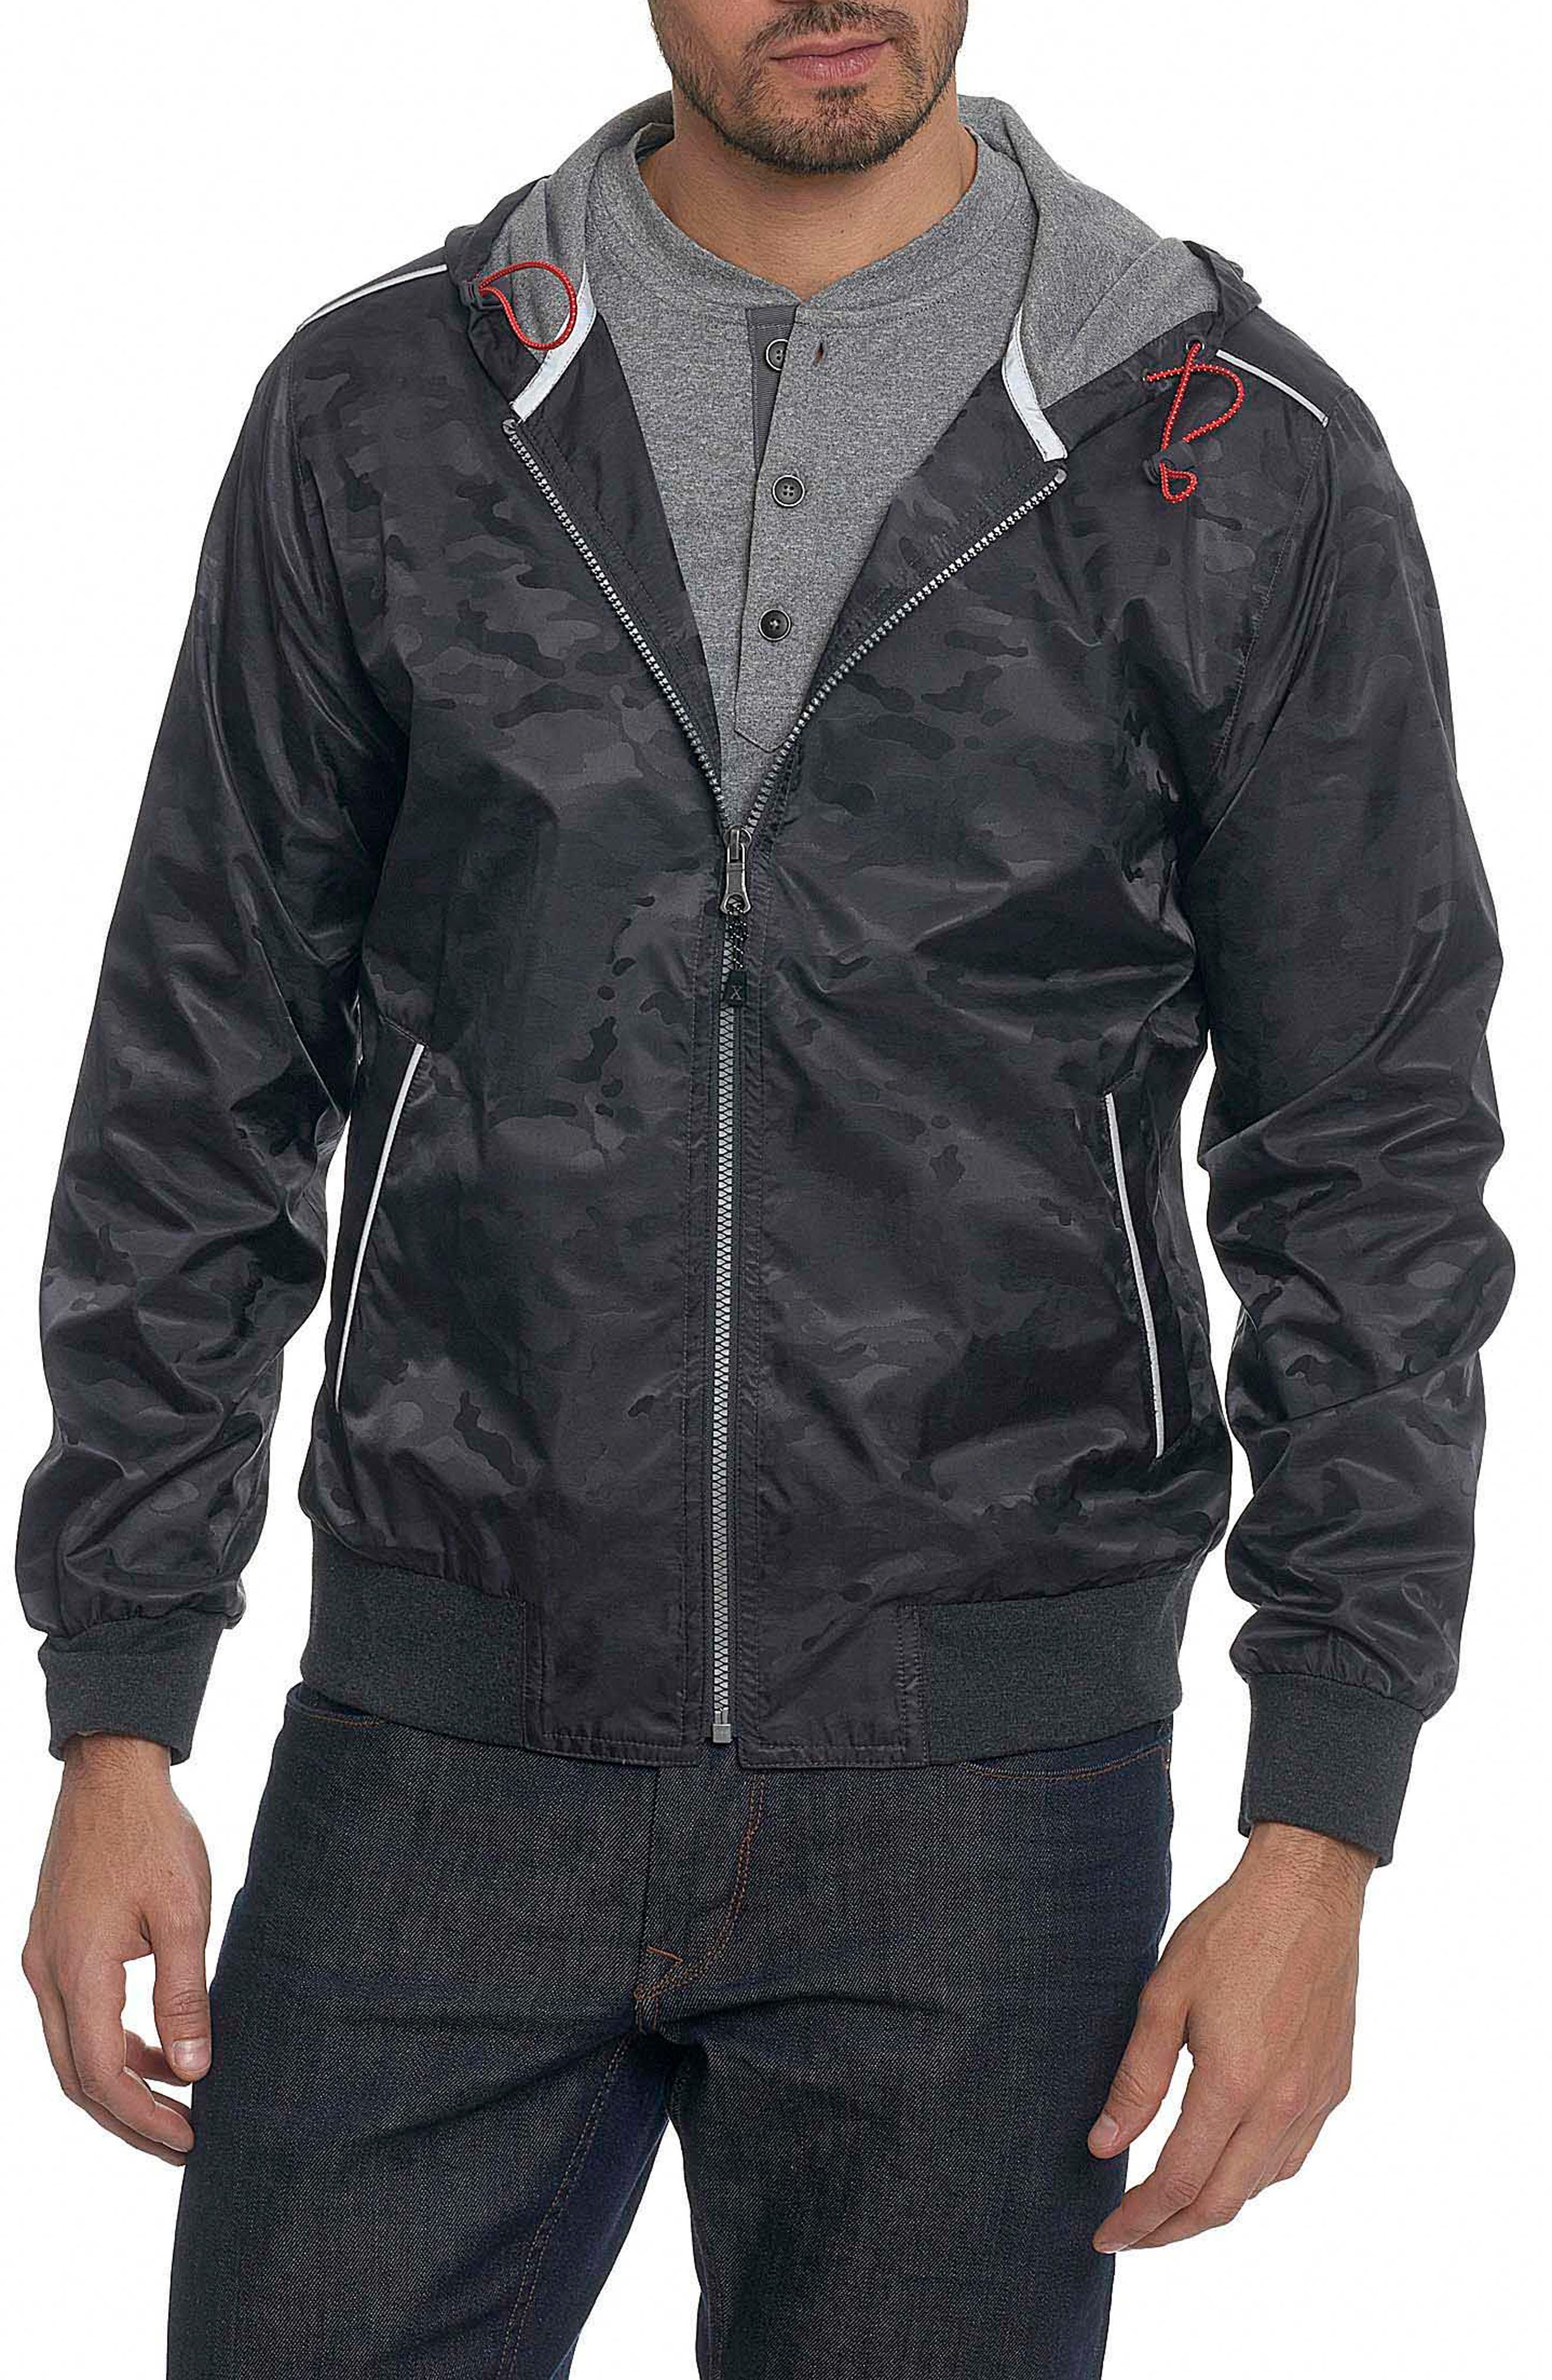 Peekskill Tailored Fit Jacket,                             Main thumbnail 1, color,                             Carbon